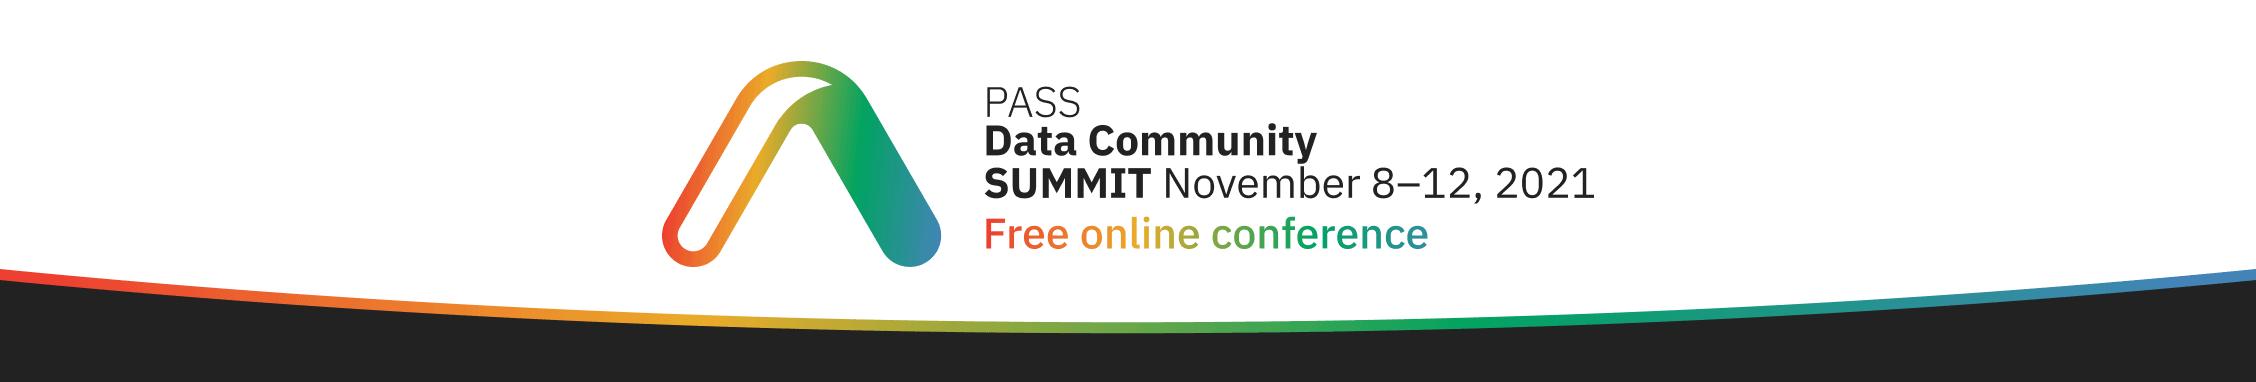 Introducing the PASS Data Community Summit Program